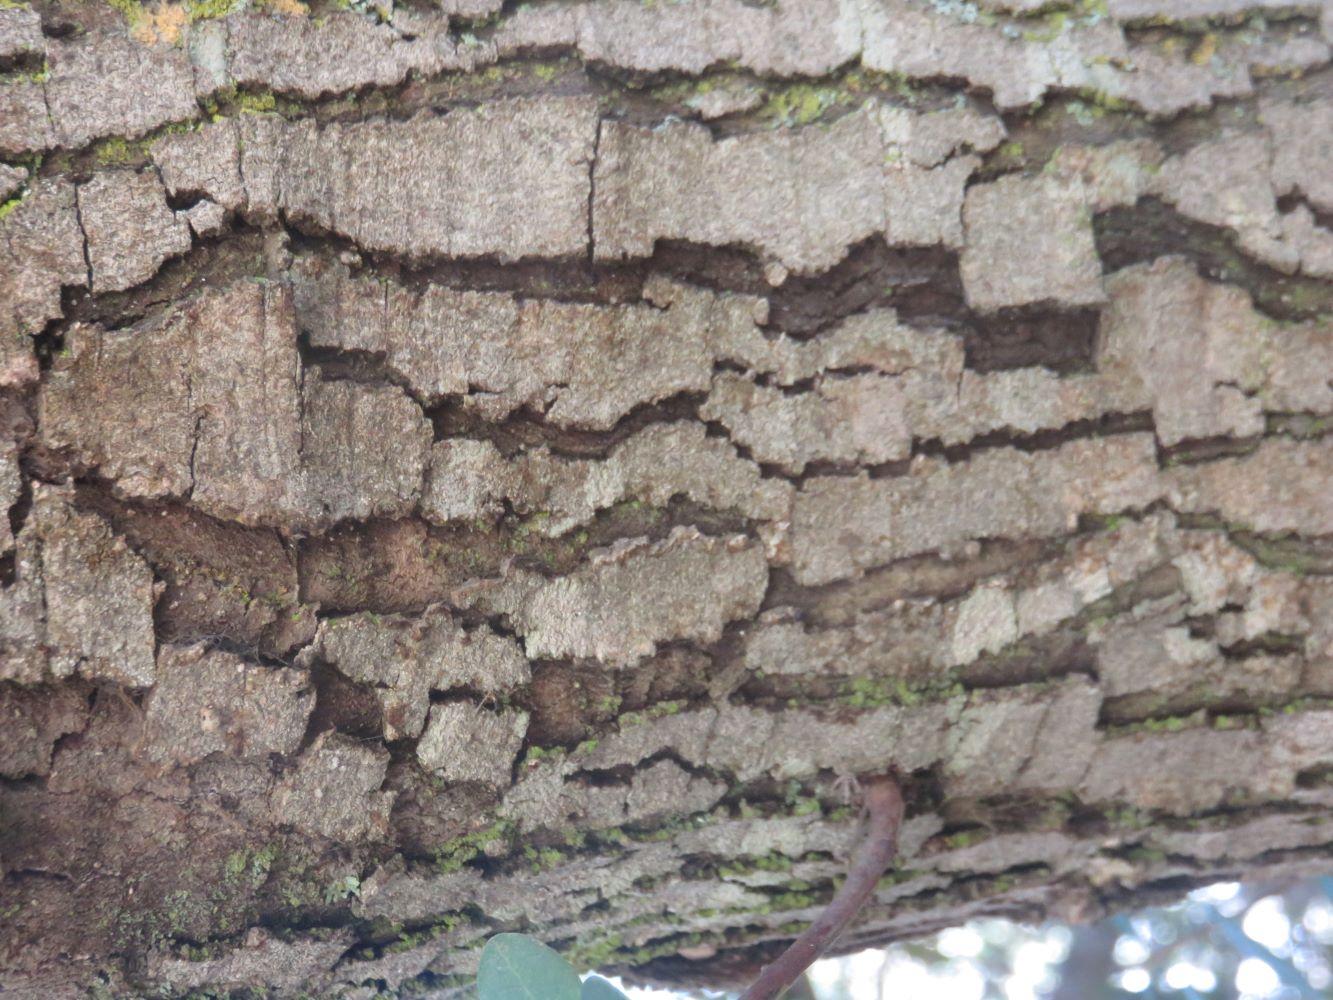 Euclea racemosa bark on an old tree.